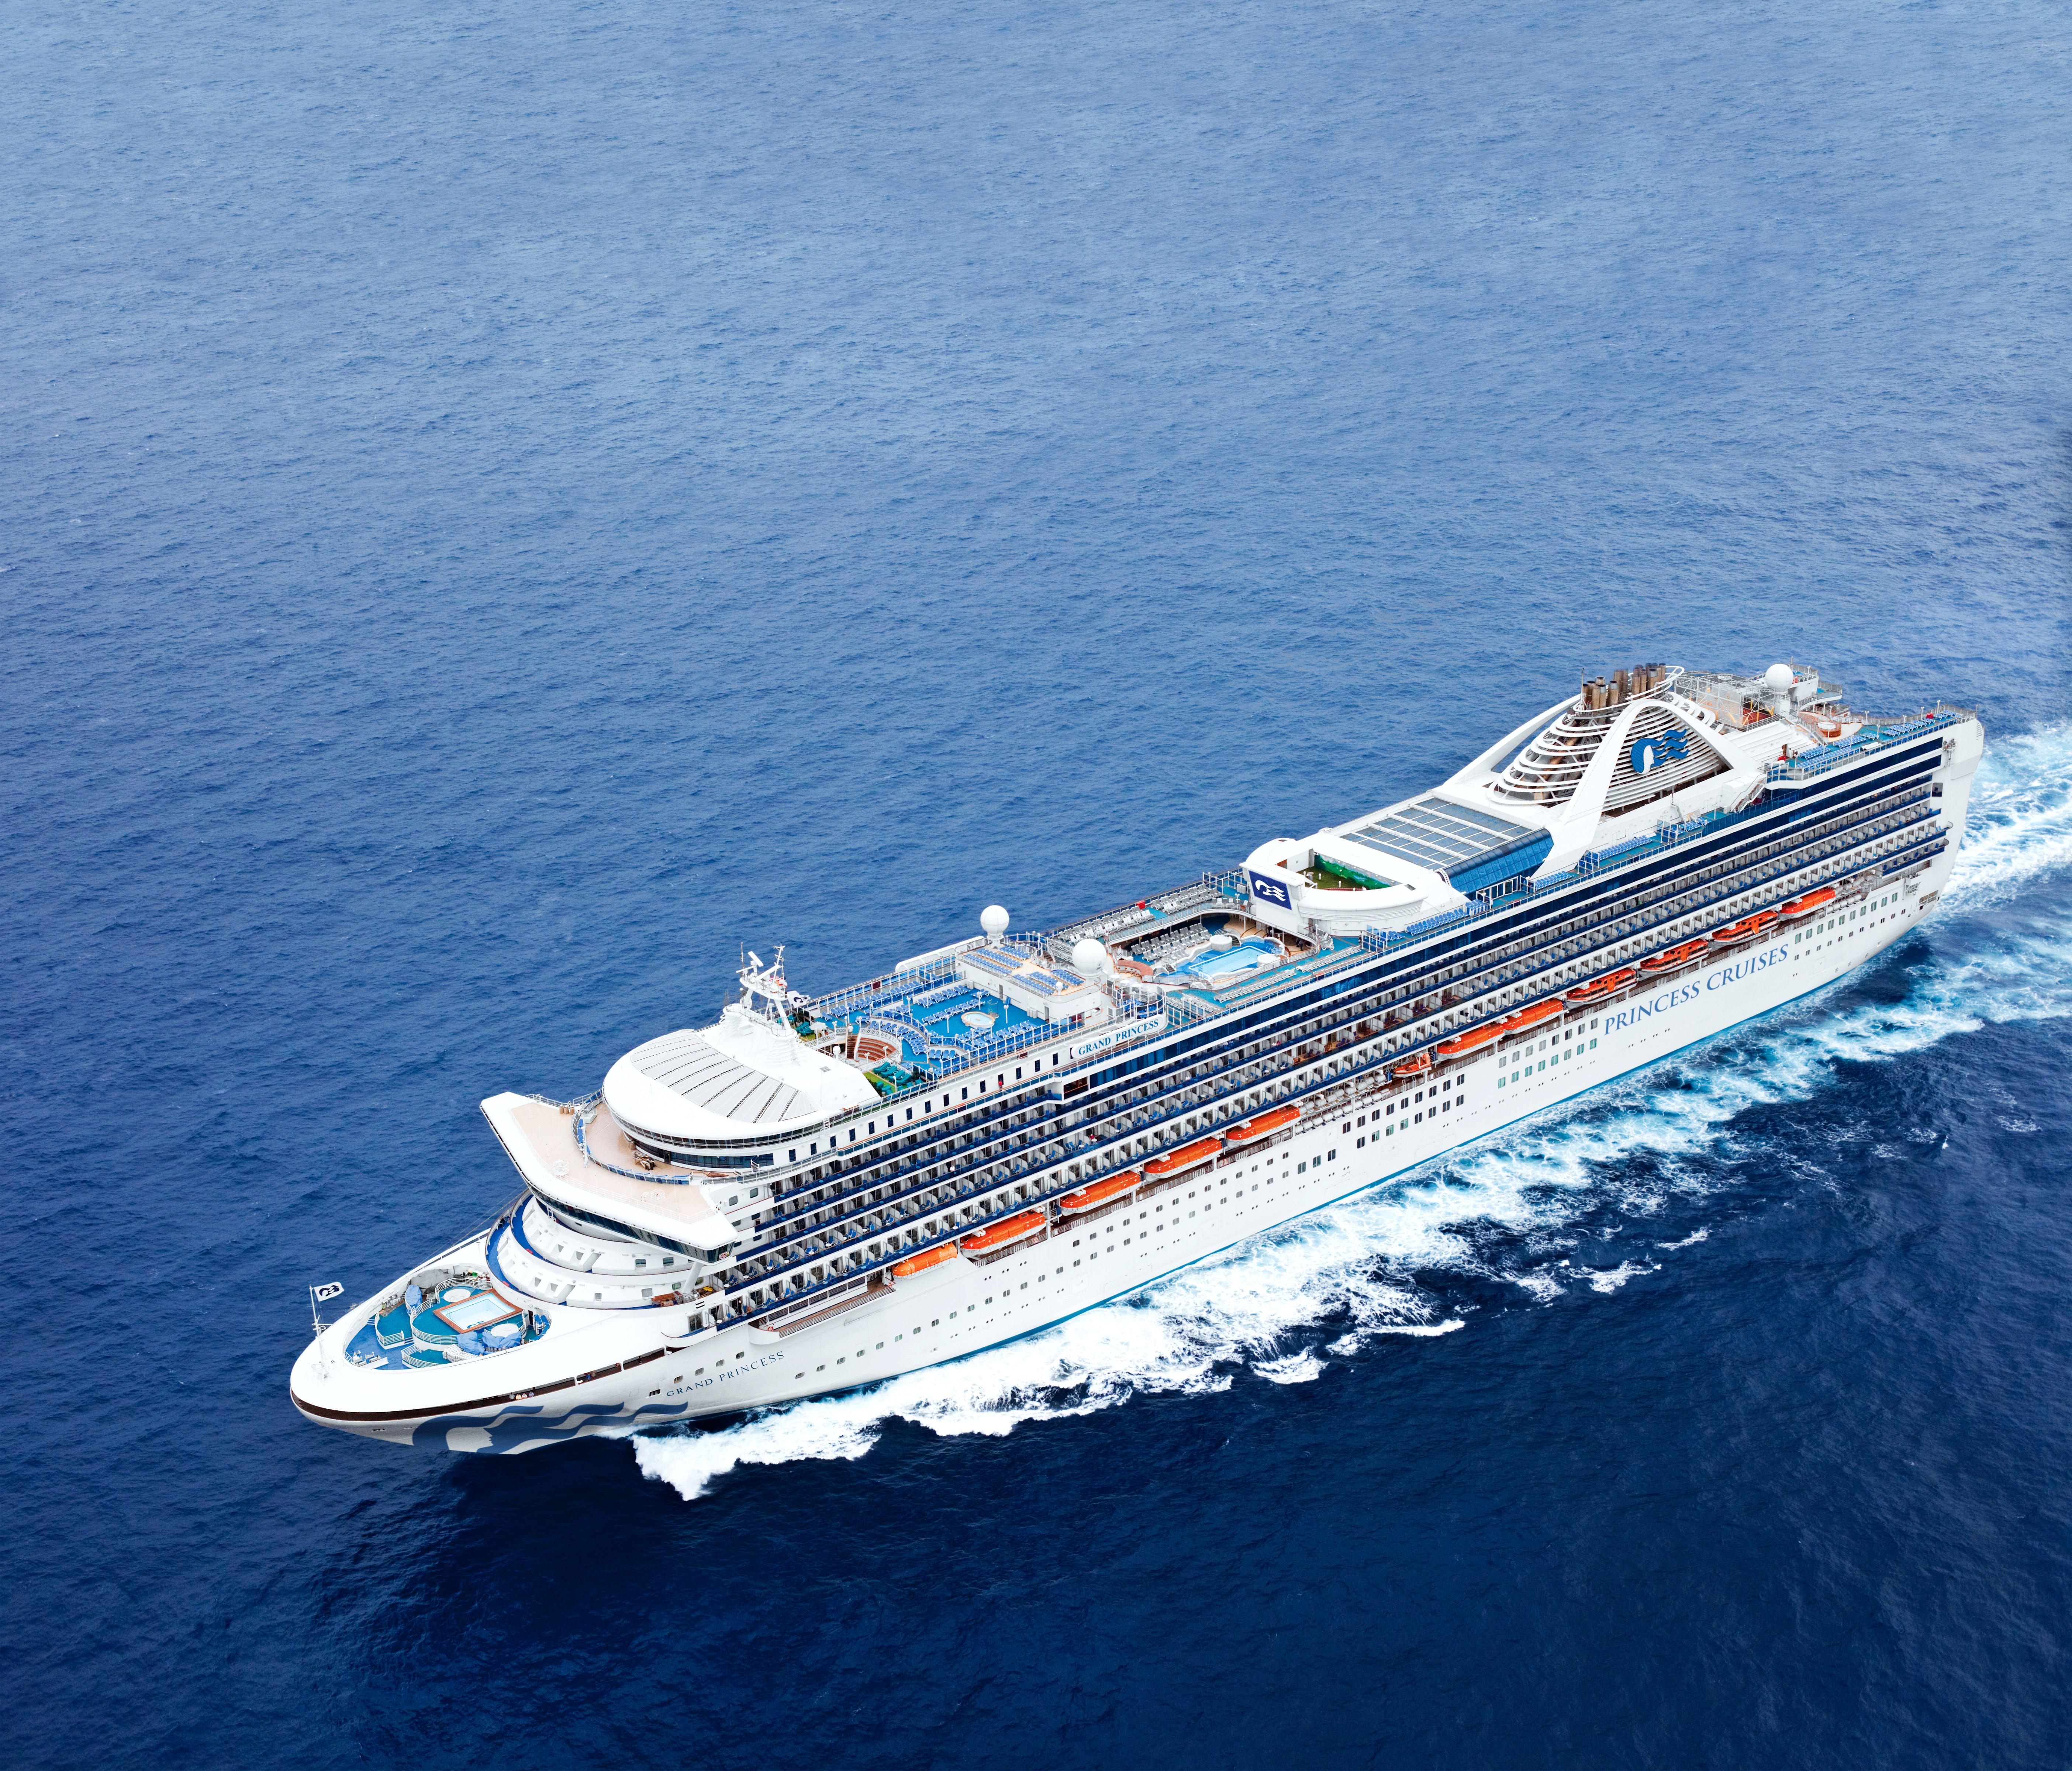 Grand Princess Passengers Begin to Disembark in Oakland, Head to Quarantine